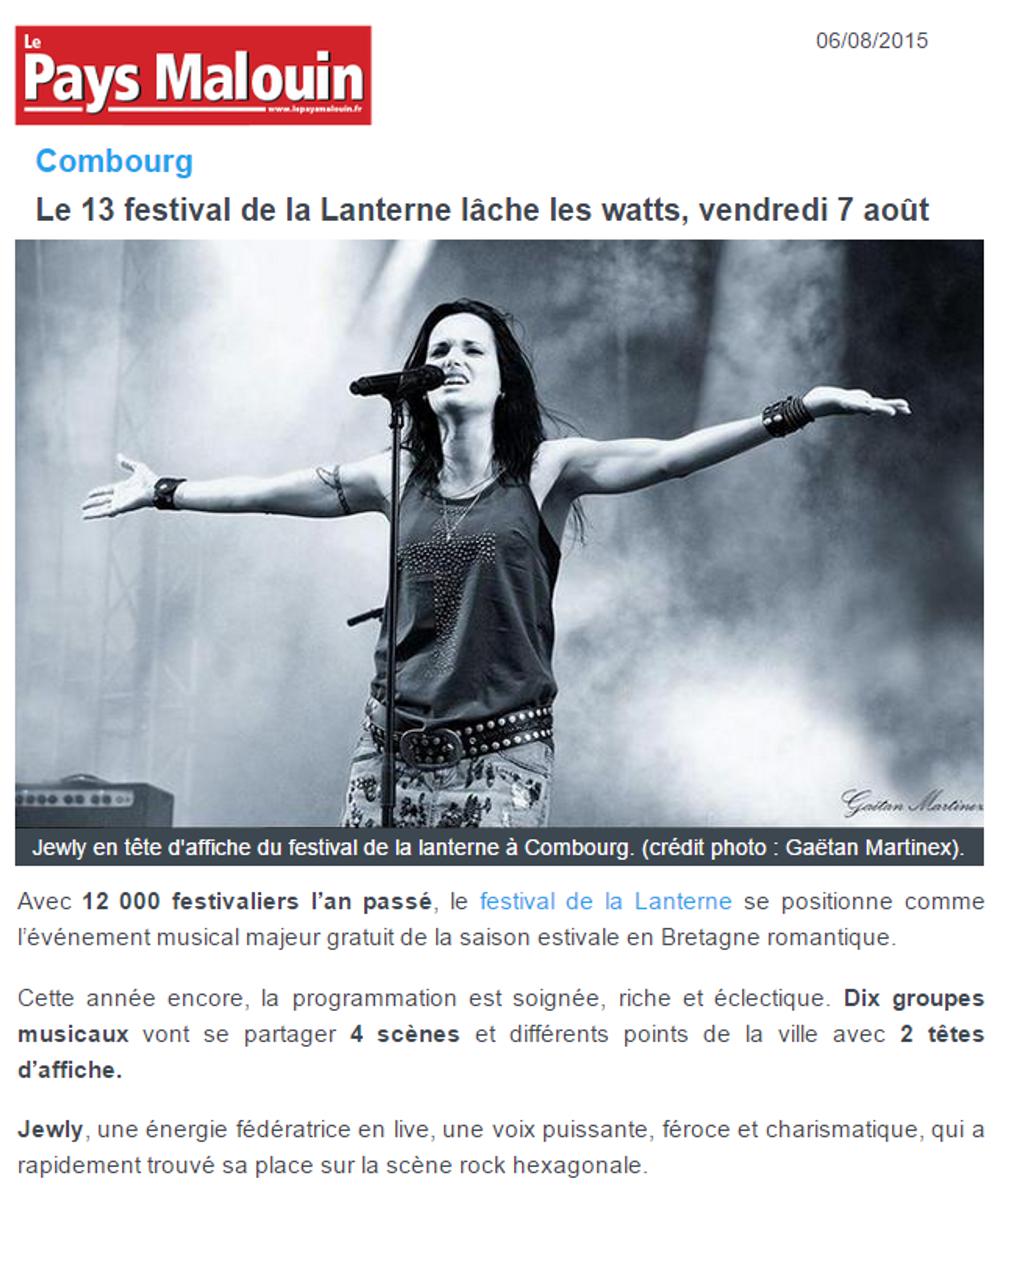 Le Pays Malouin – 06/08/2015